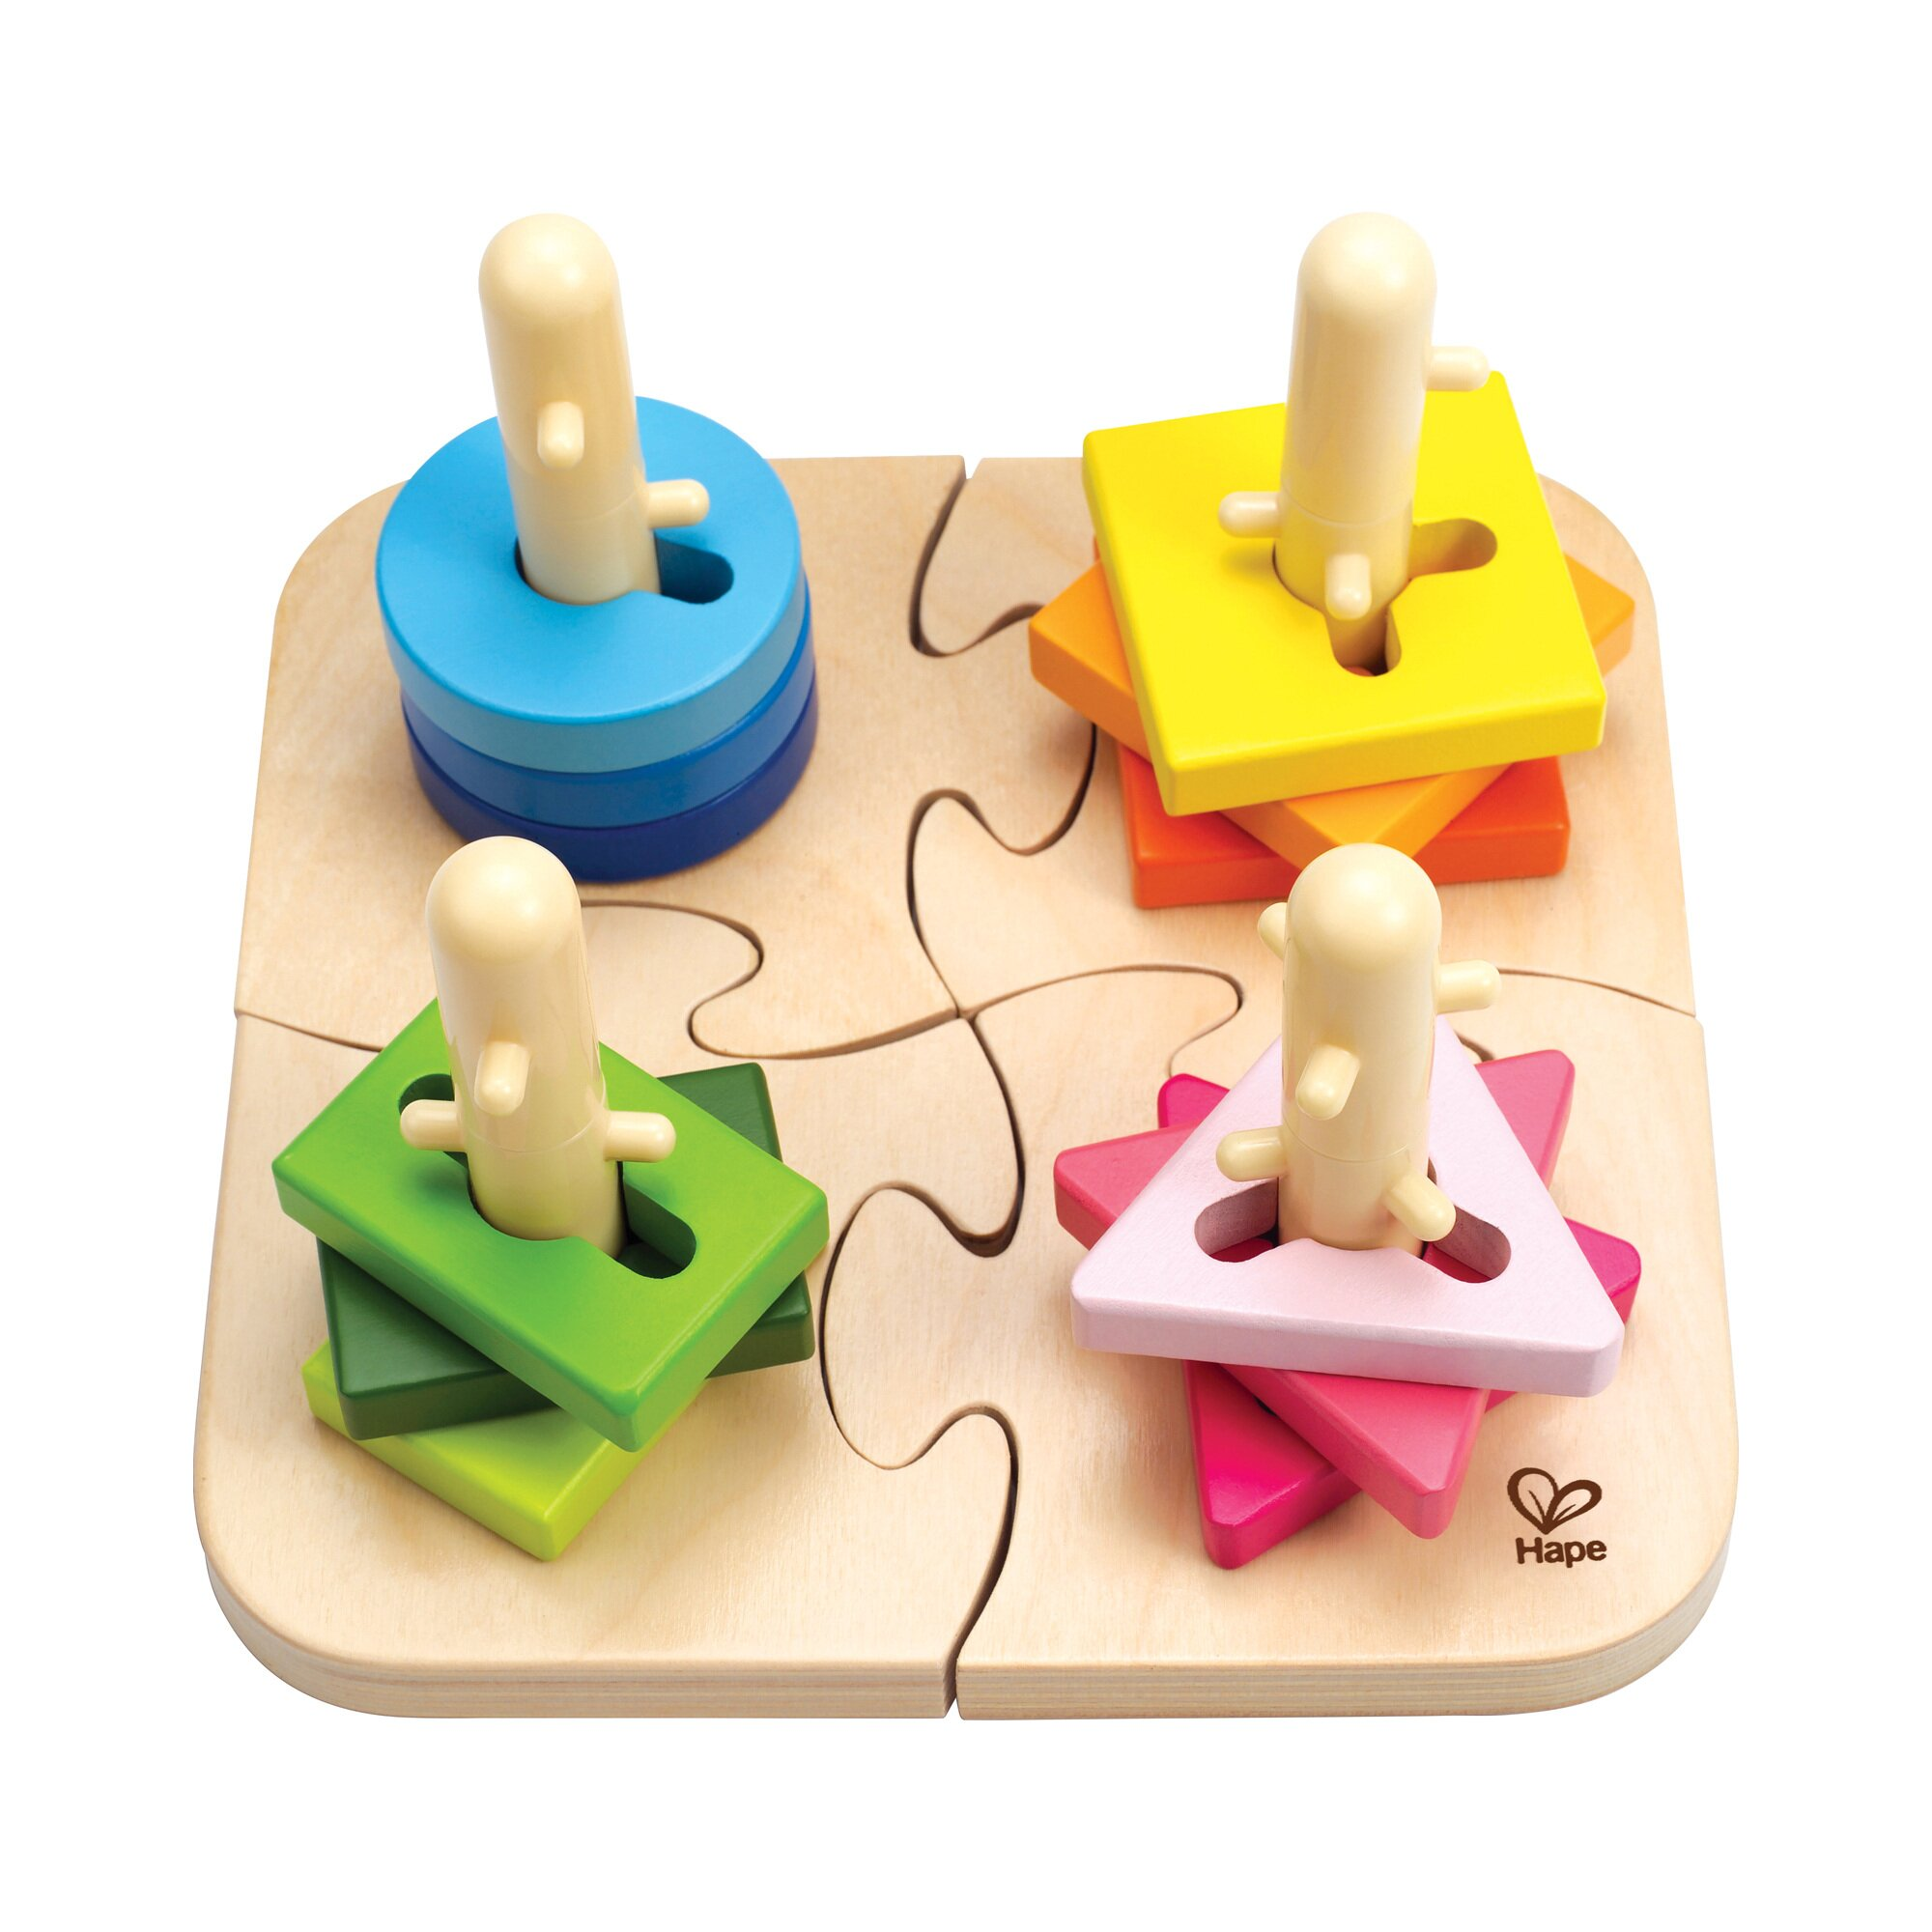 Hape Steckspiel Kreatives Steckpuzzle